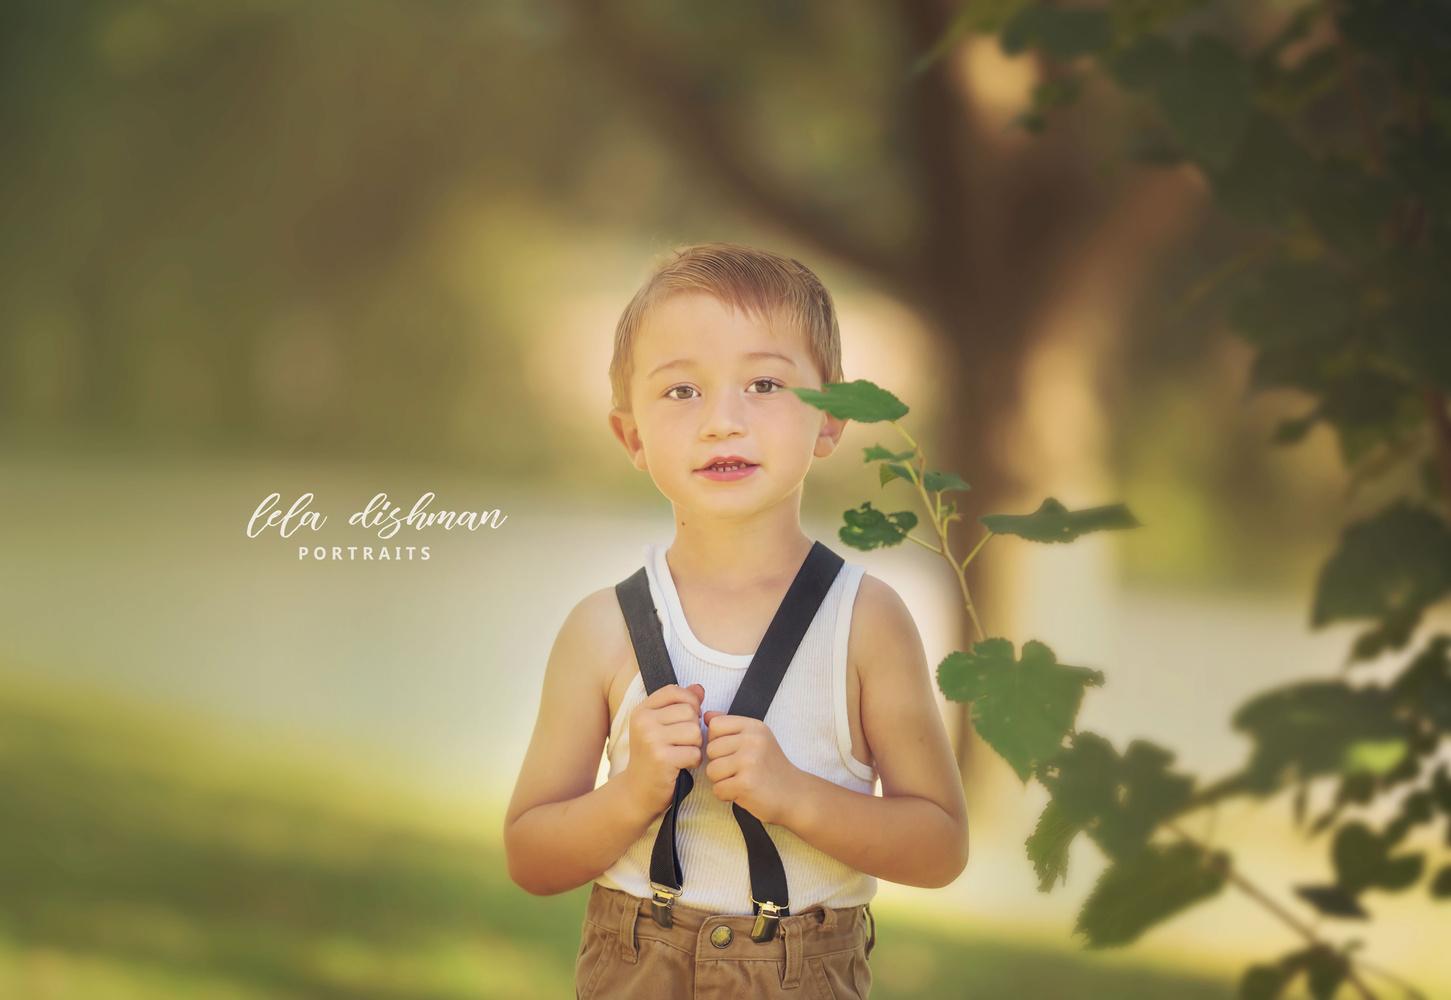 Just a boy by Lela Dishman